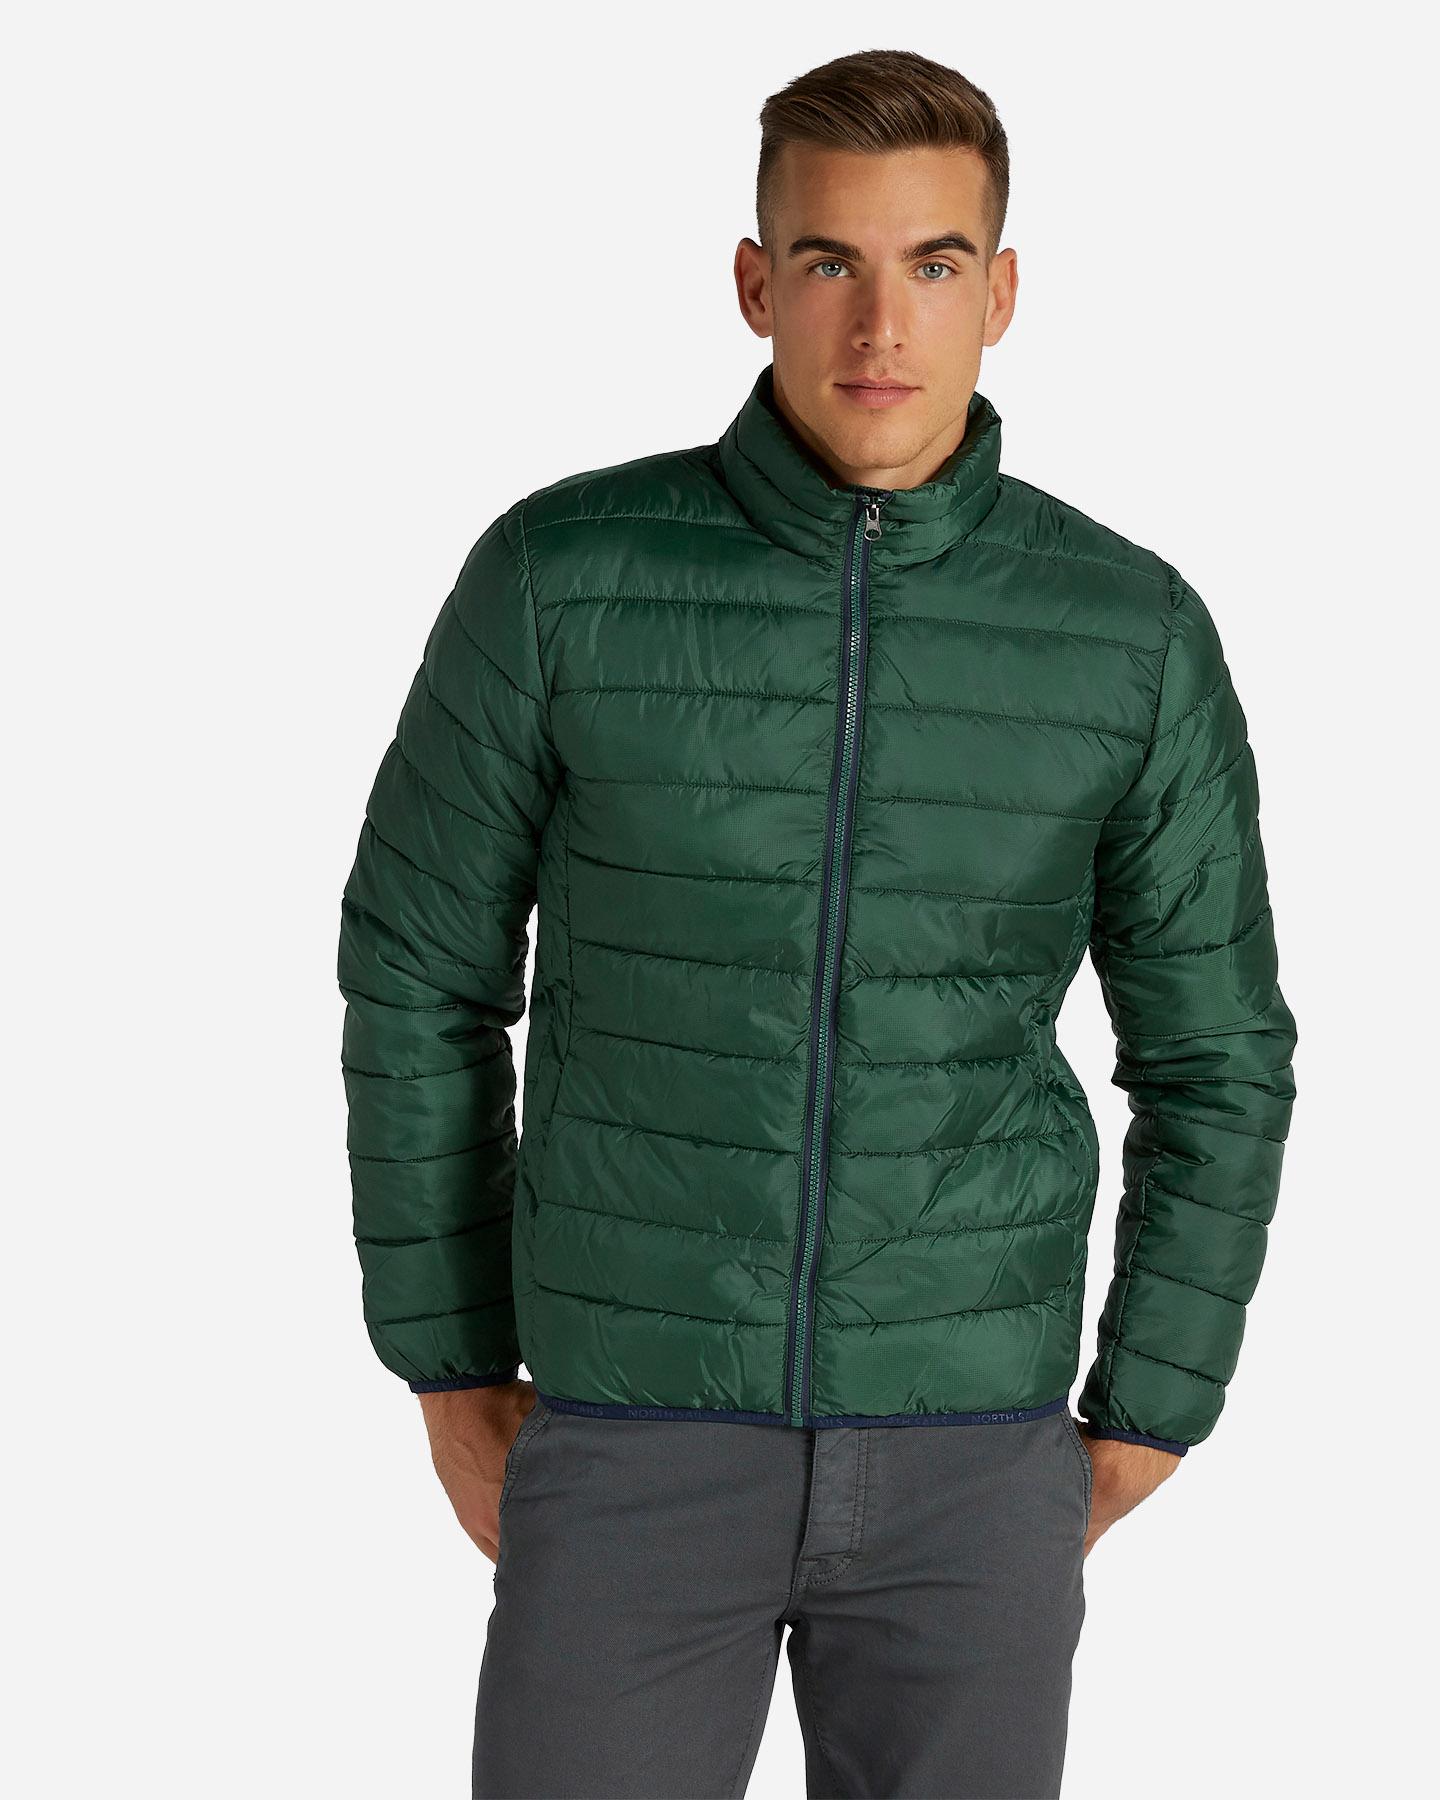 NORTH SAILS Skye Jacket T-Shirt Uomo